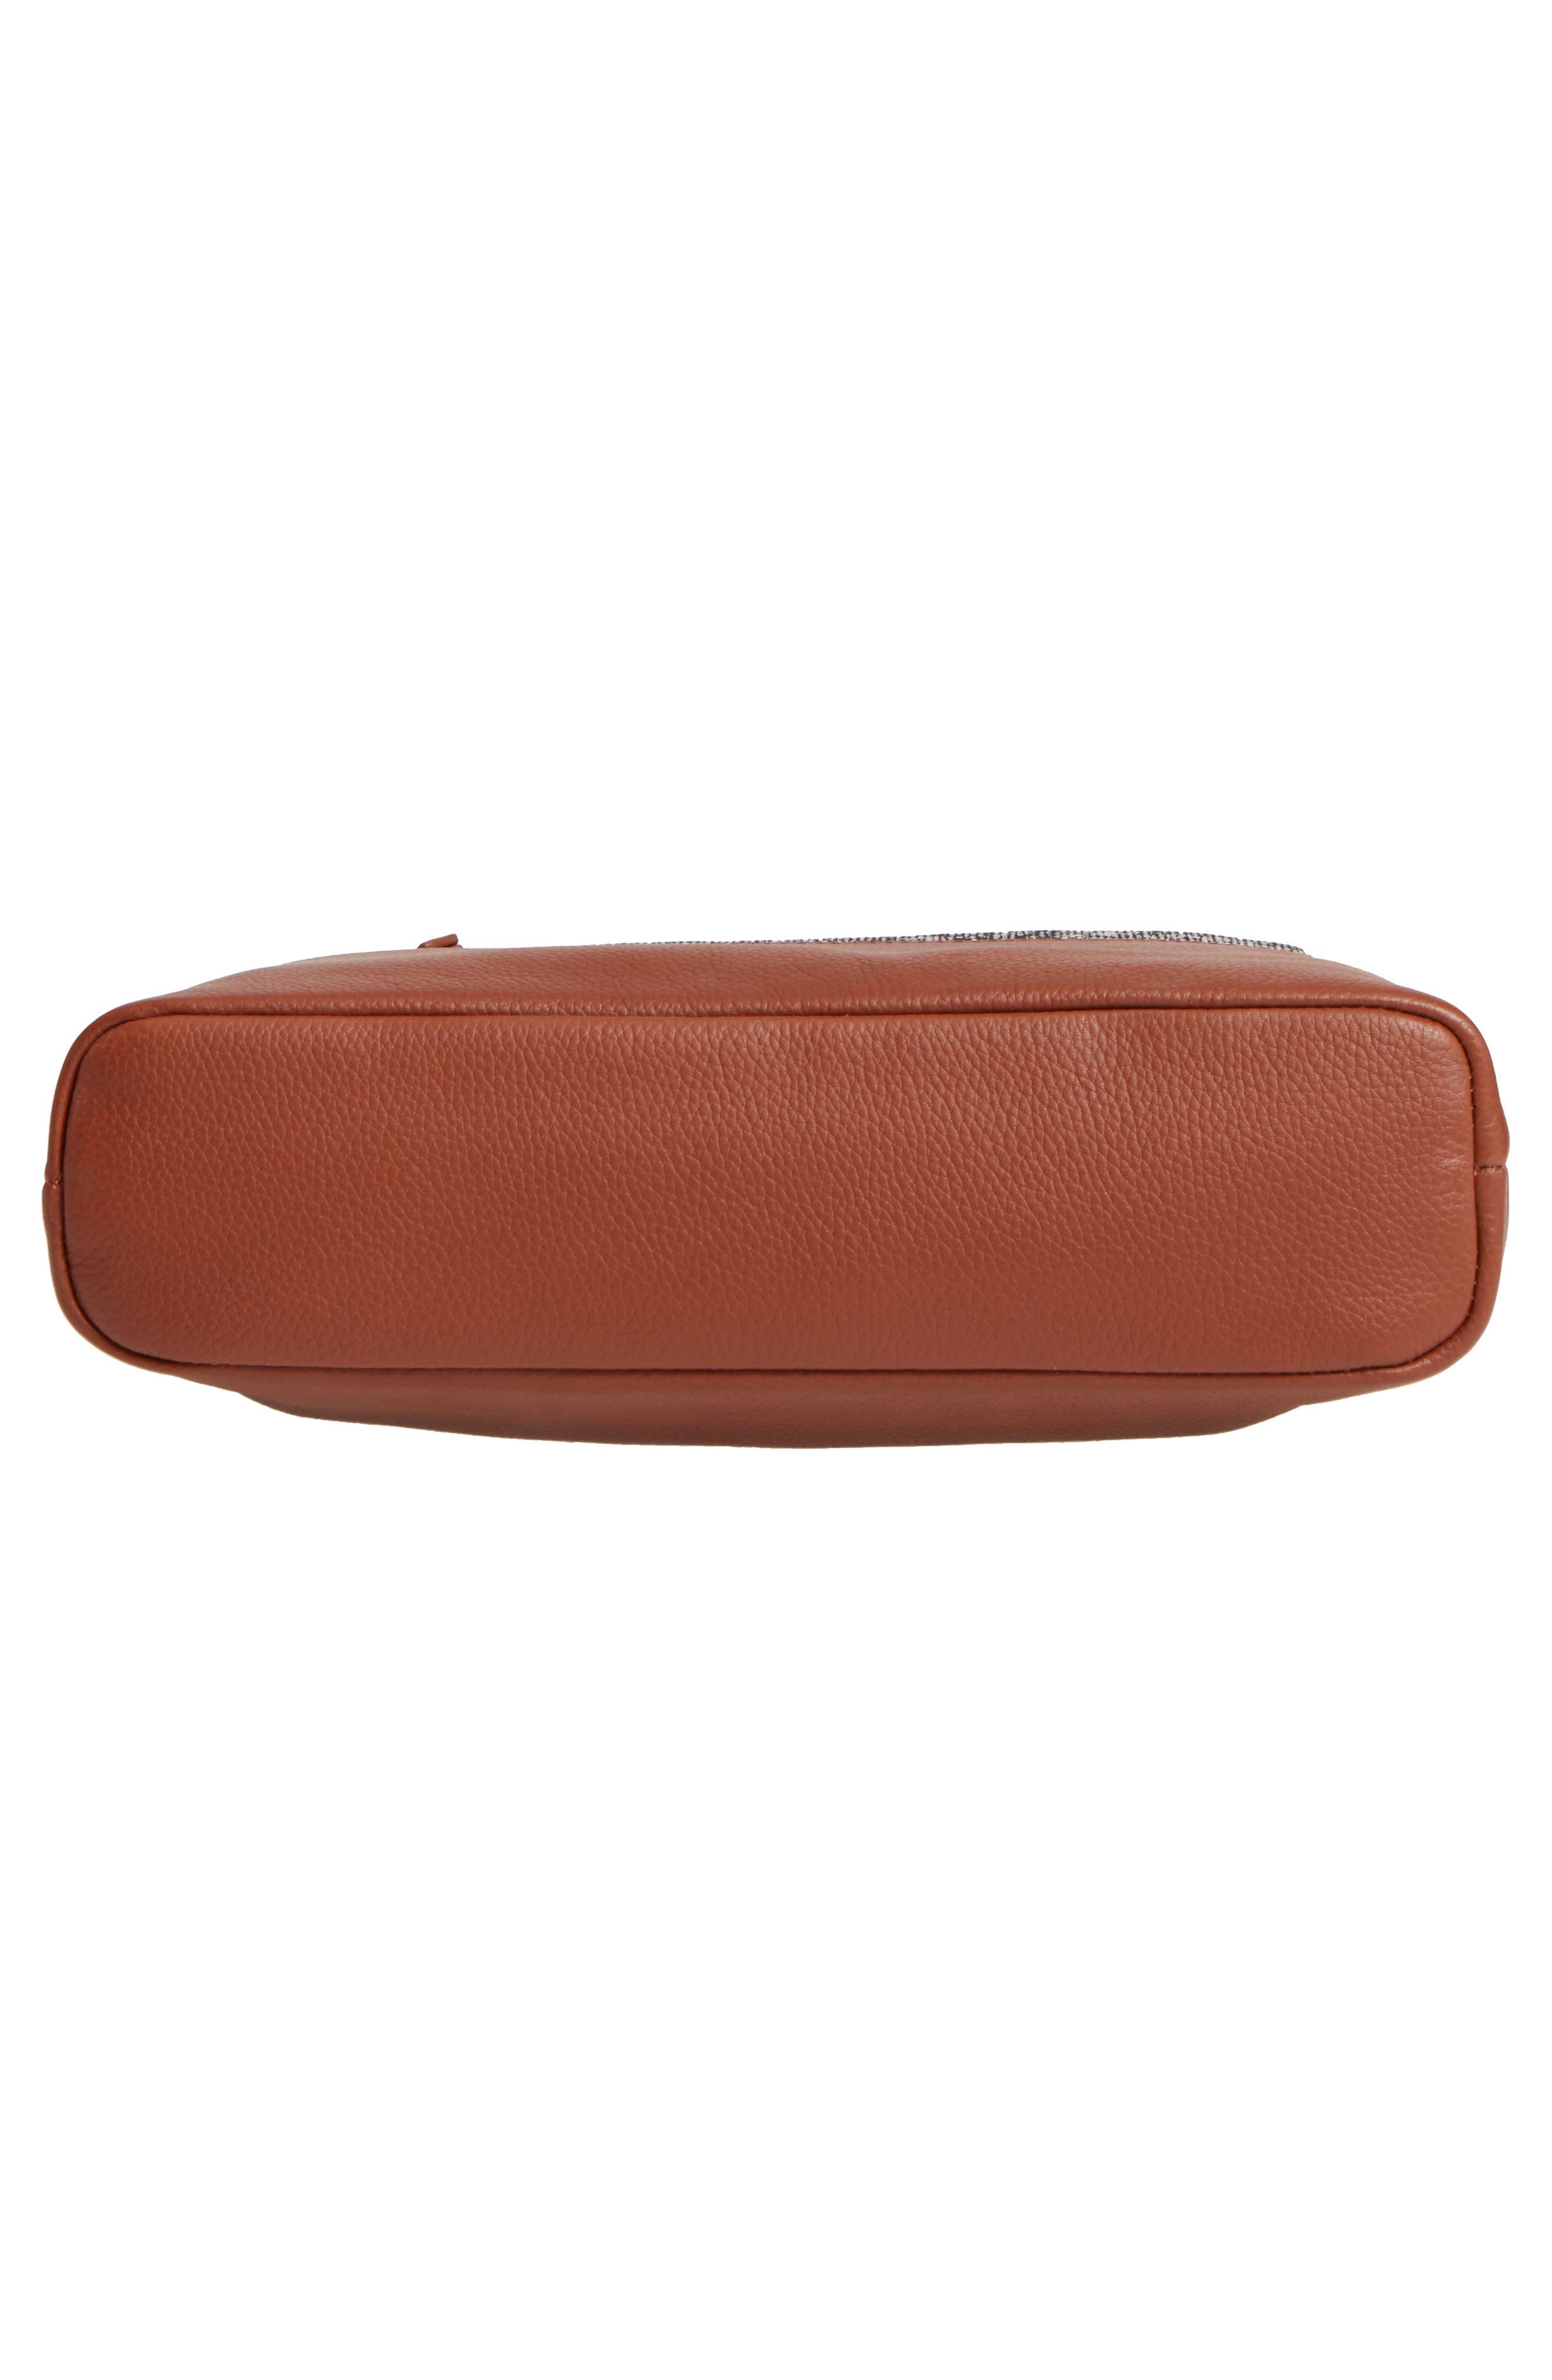 Medium Brea Crossbody Bag,                             Alternate thumbnail 4, color,                             Whiskey